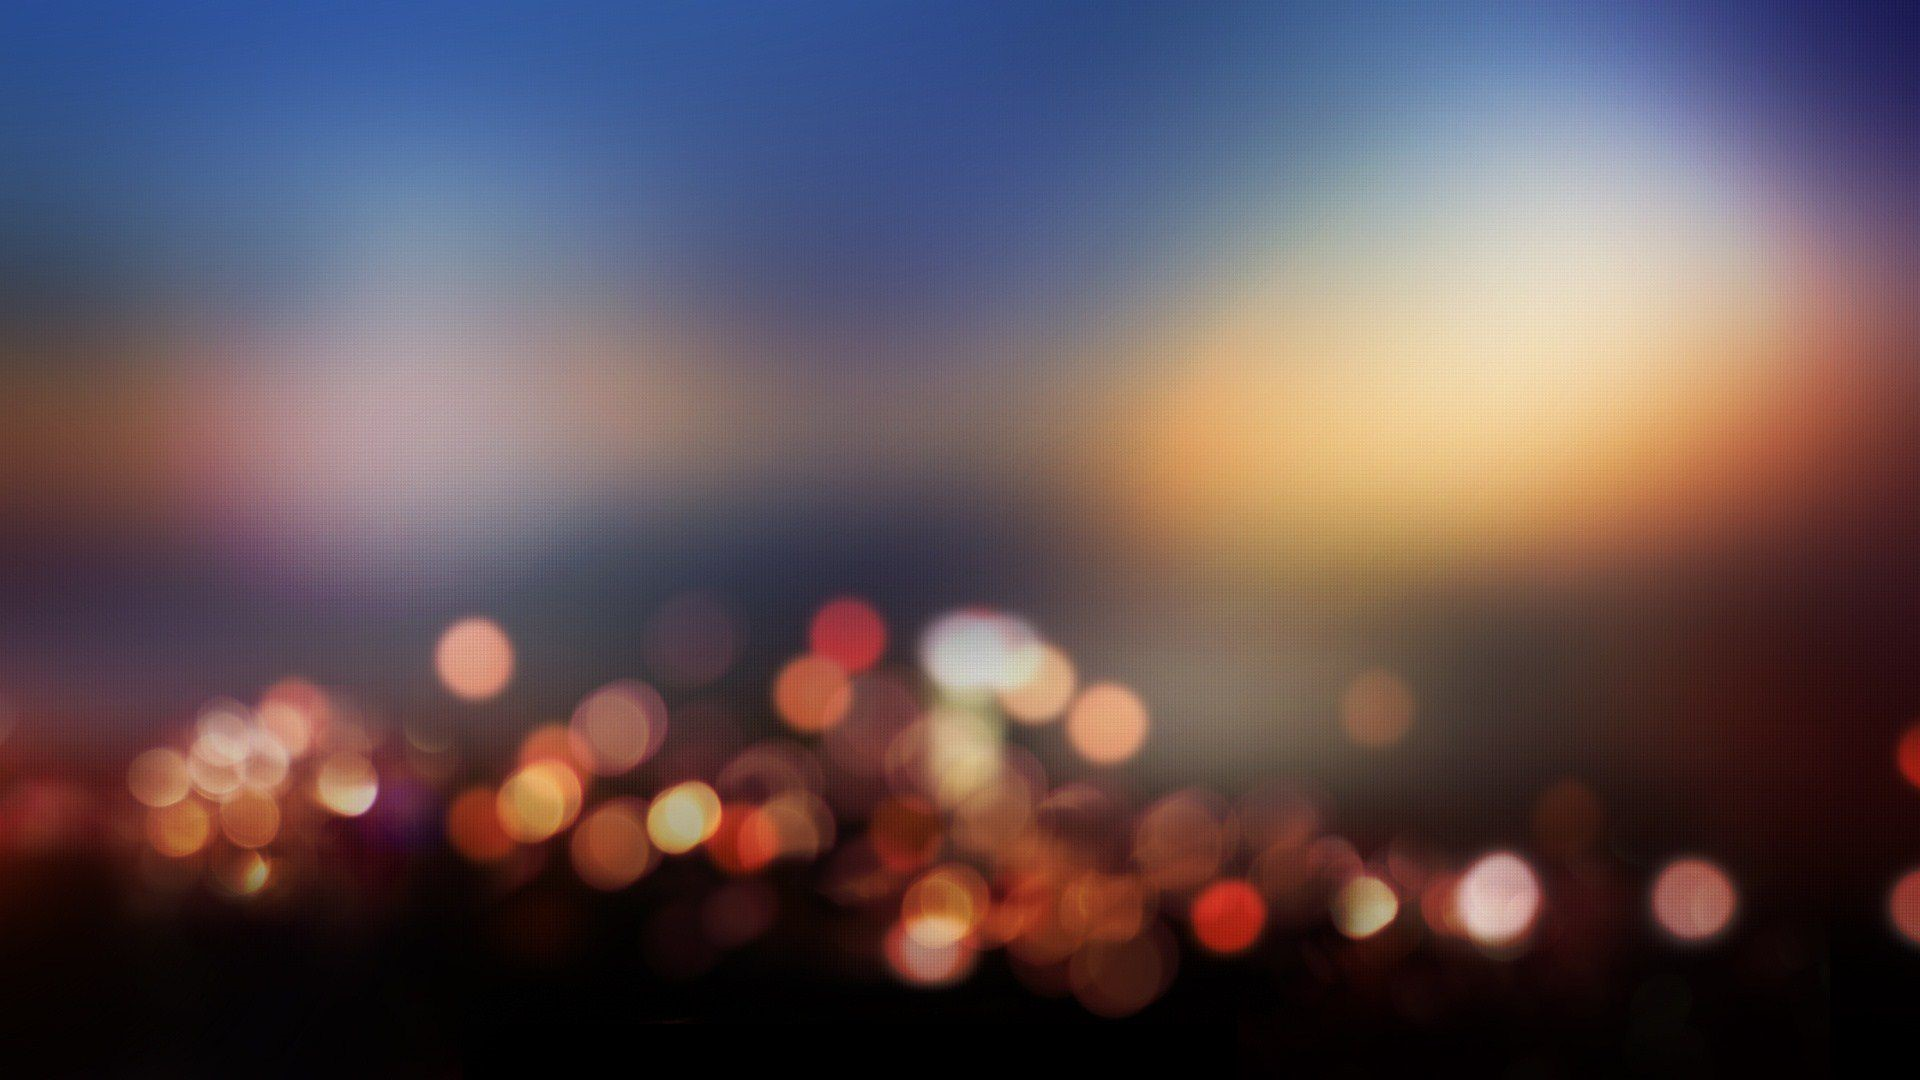 Bokeh City Lights Wallpaper